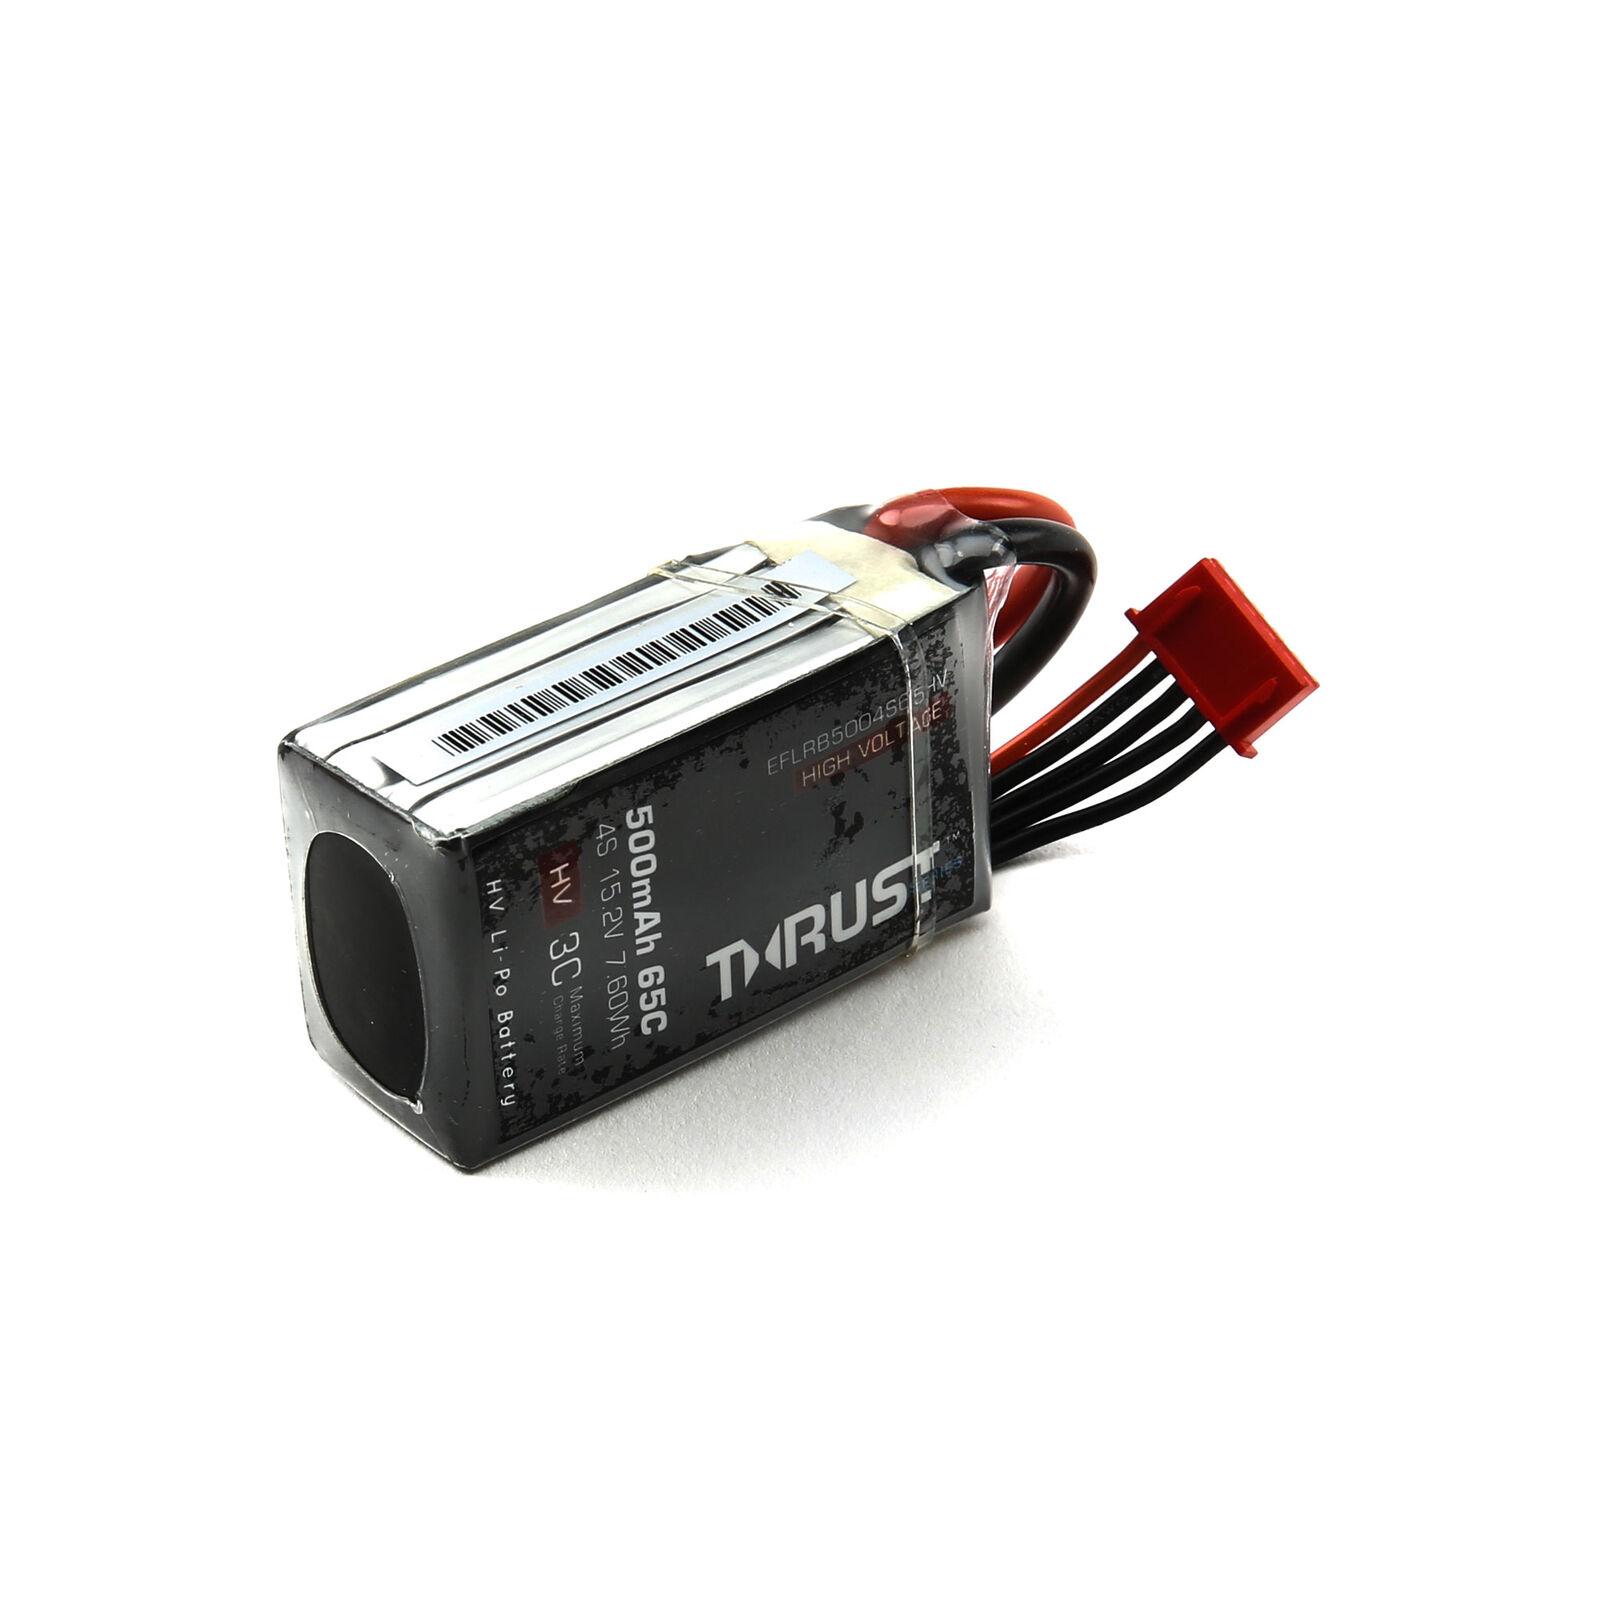 15.2V 500mAh 4S 65C Thrust FPV HV-LiPo Battery: XT30